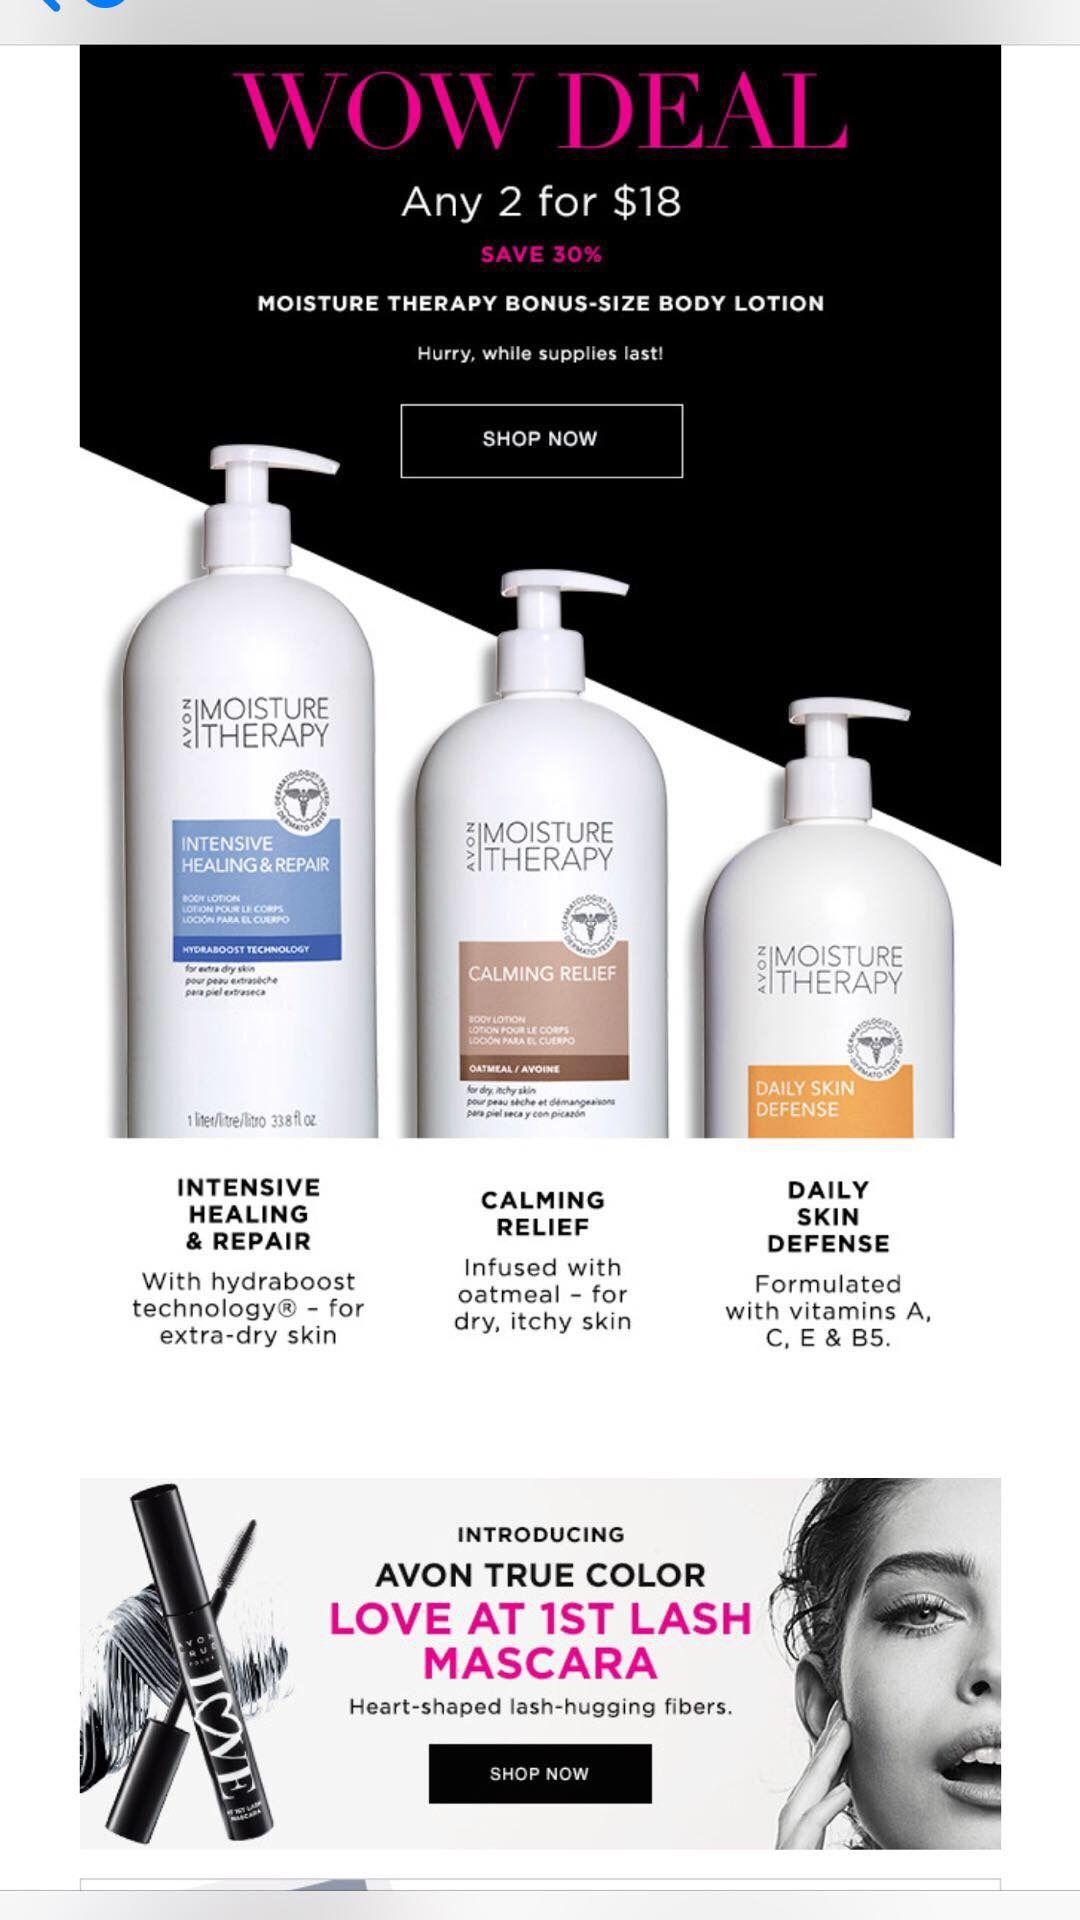 Avon bonus size body lotion on sale right now. Moisture